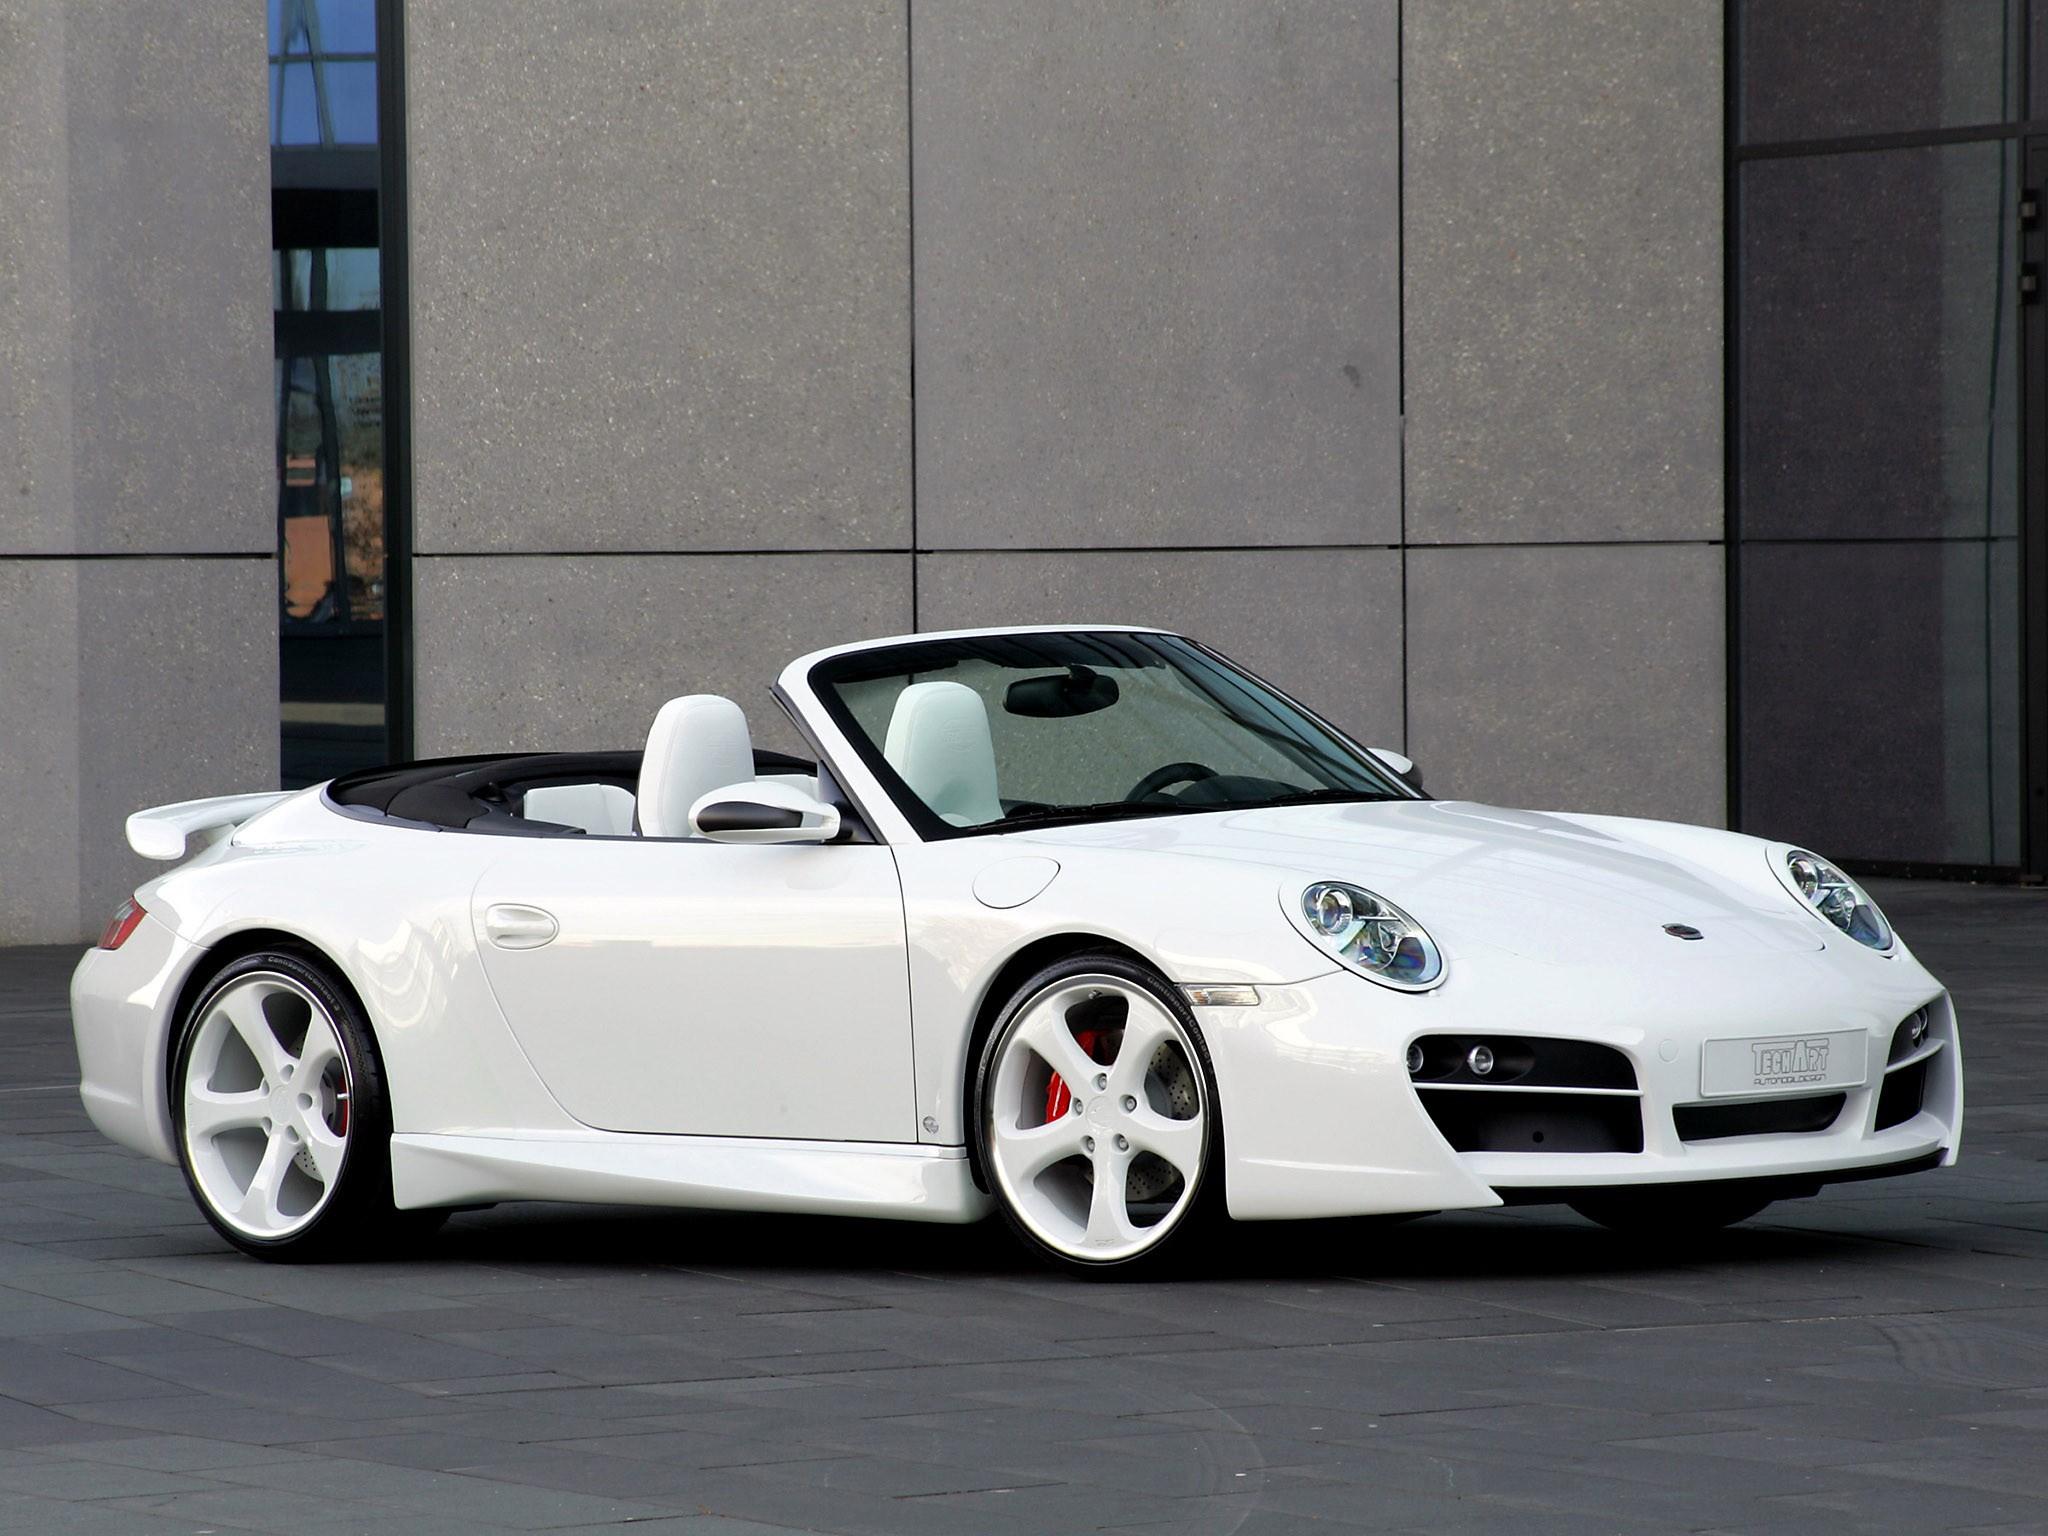 2007 Techart Porsche 911 Carrera 4s Cabriolet 997